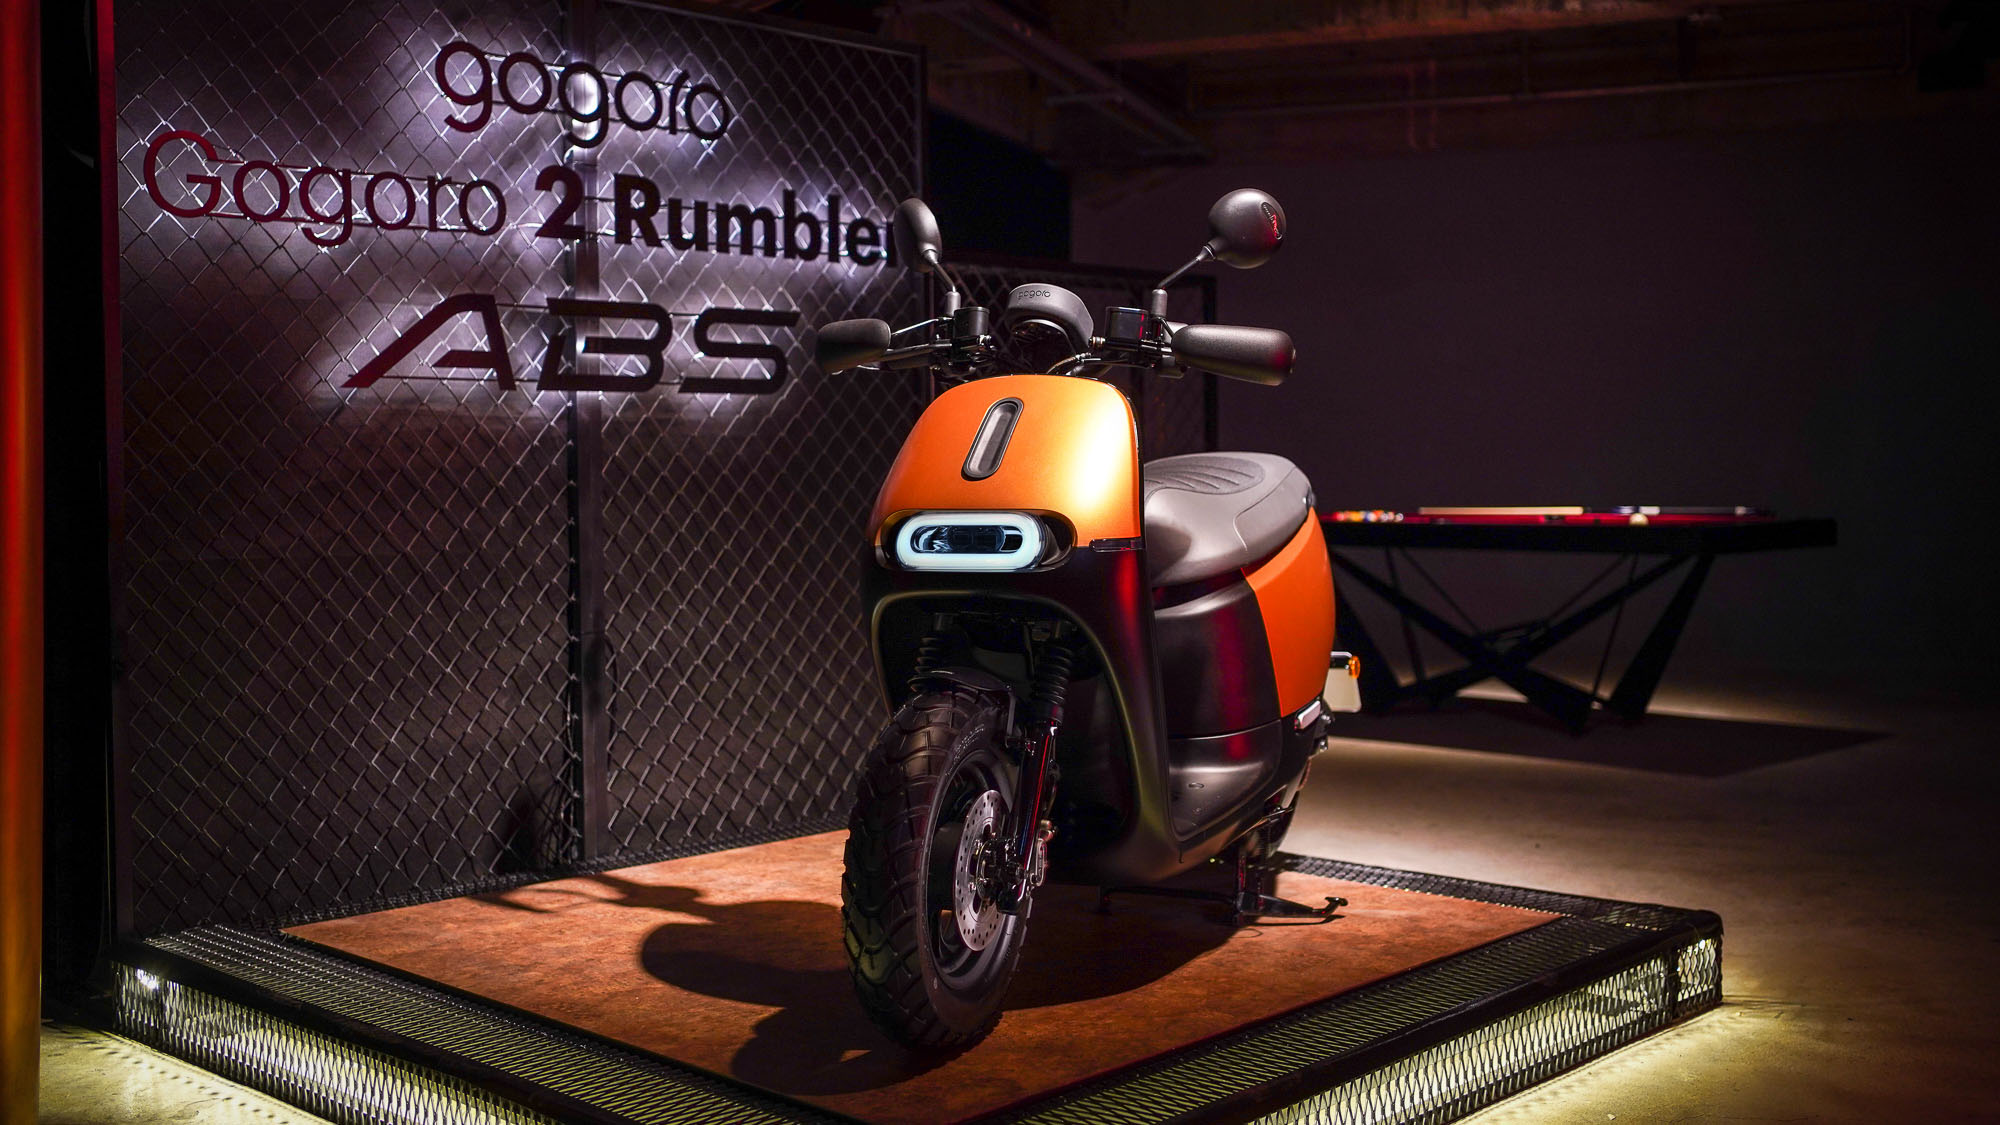 Gogoro 2 Rumbler ABS「閃霧銅」登場,飛鏢最準就能騎回家!